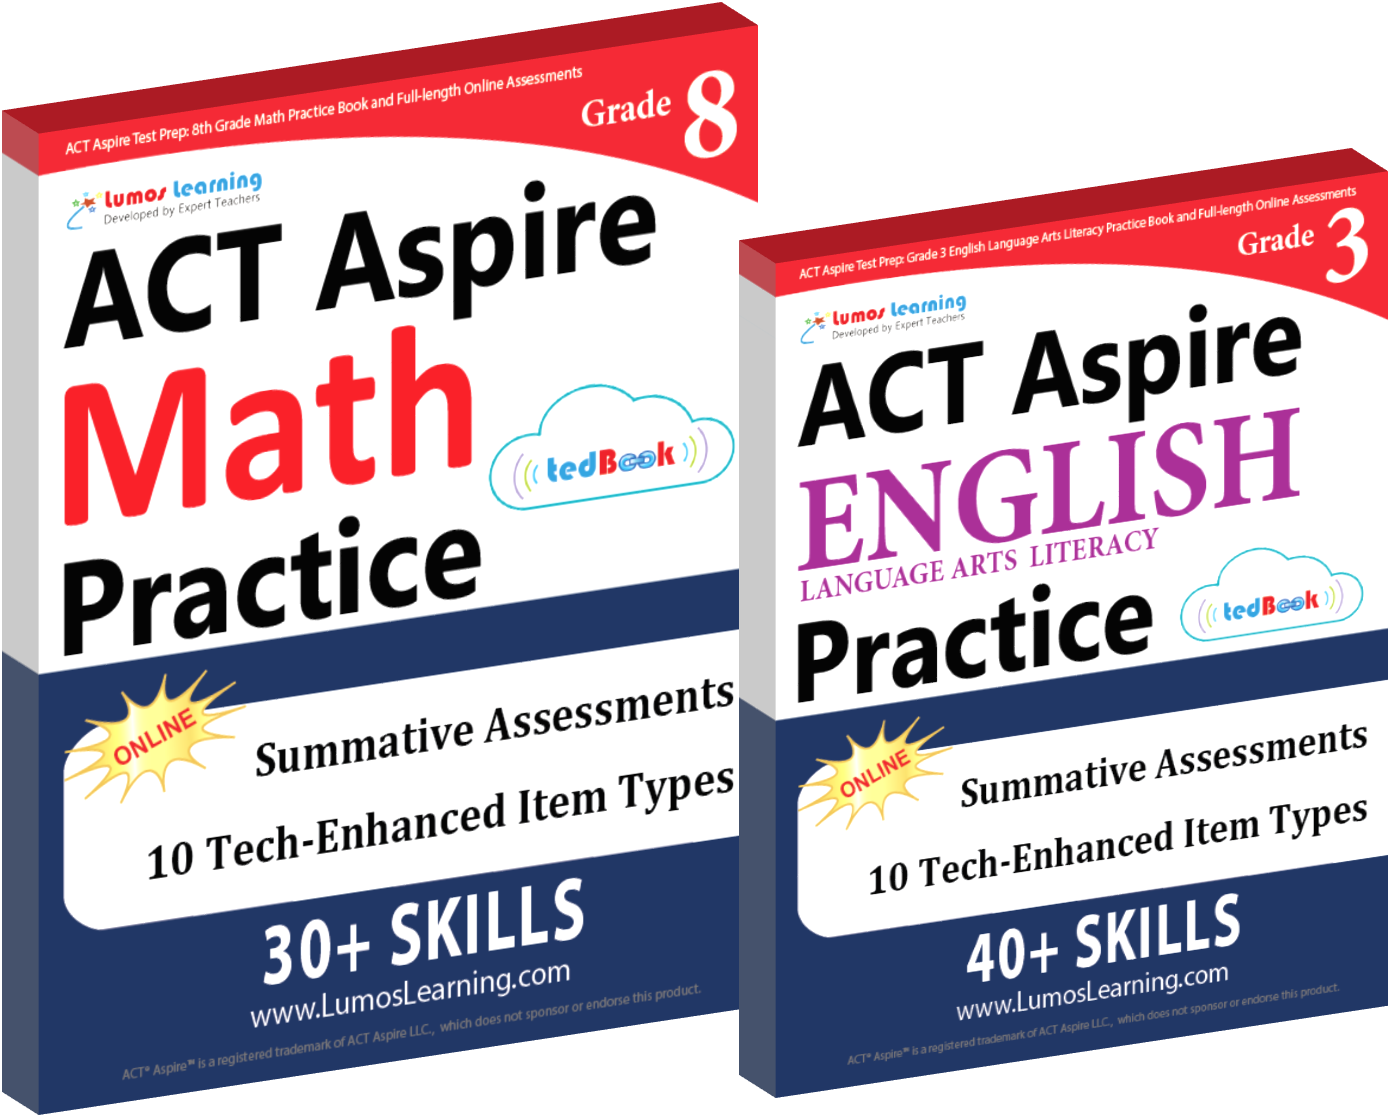 ACT Aspire Assessment Practice Resources for Schools | Lumos